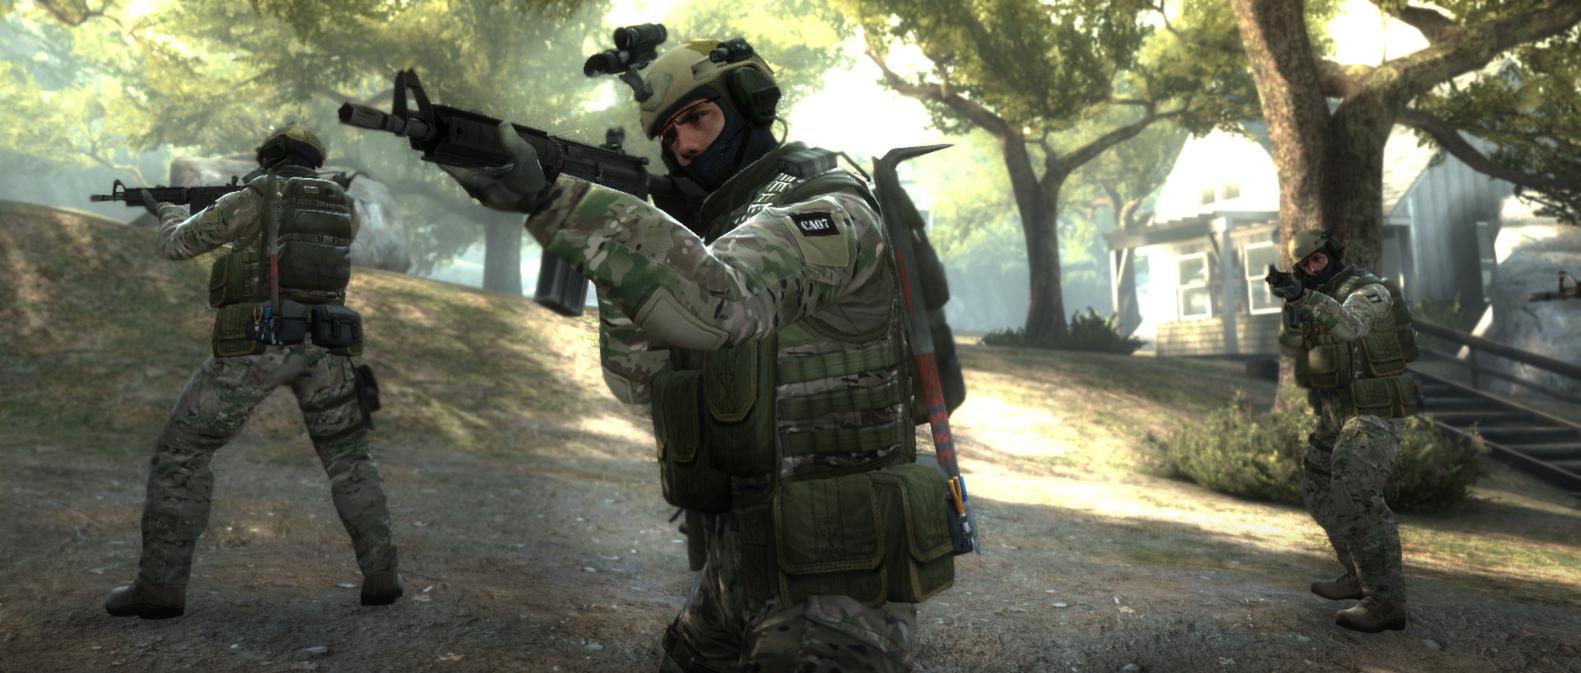 Screenshot of Counter Strike: Global Offensive (128 Tick) server hosting